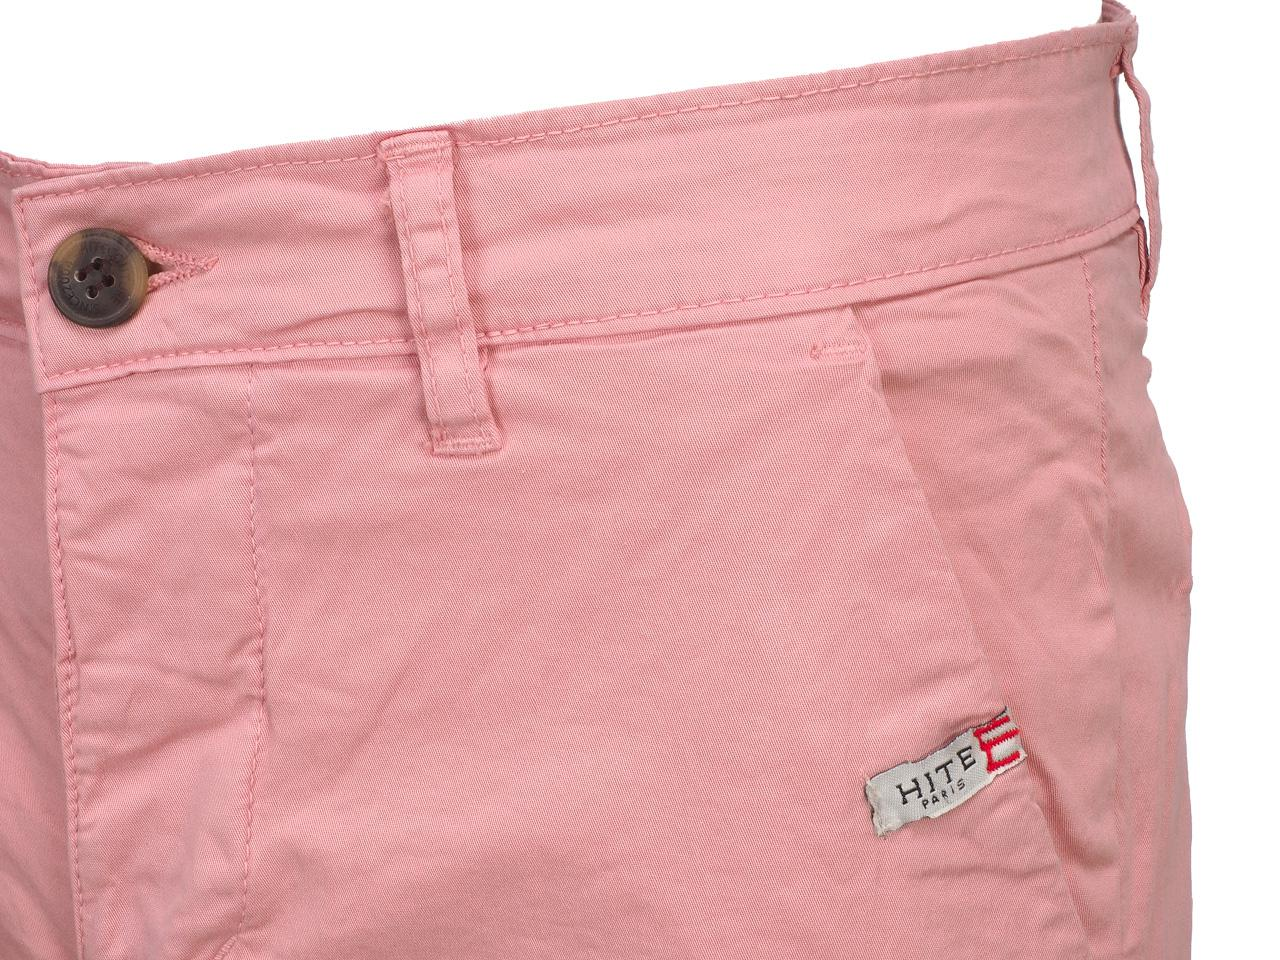 Bermuda-Shorts-Hite-Couture-Vobier-Rse-Bermuda-Chino-Pink-11606-New thumbnail 3